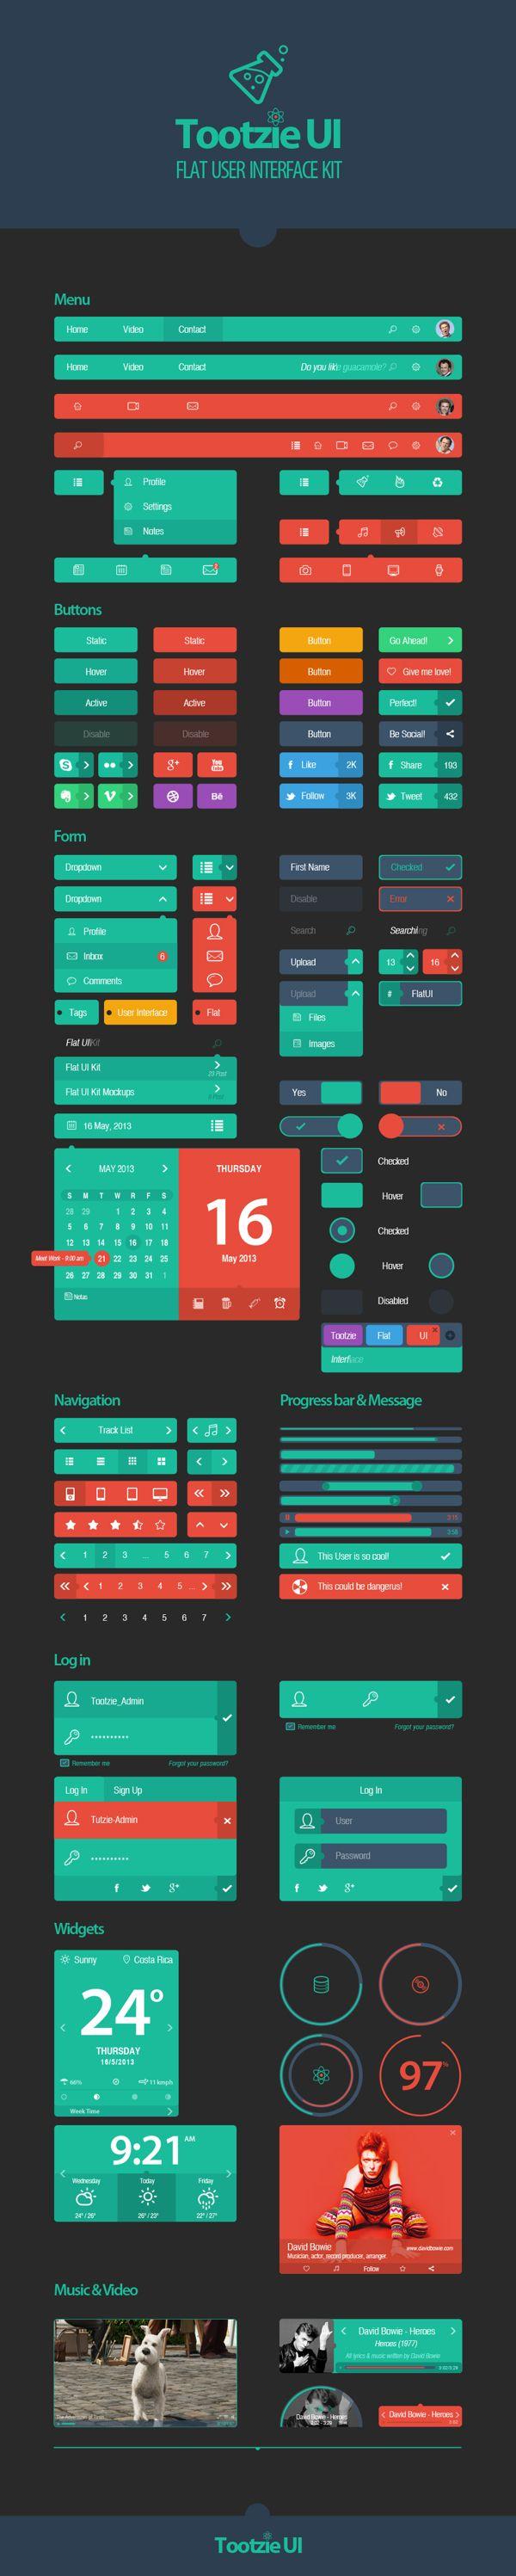 Tootzie UI Kit by Josué Solano, via Behance